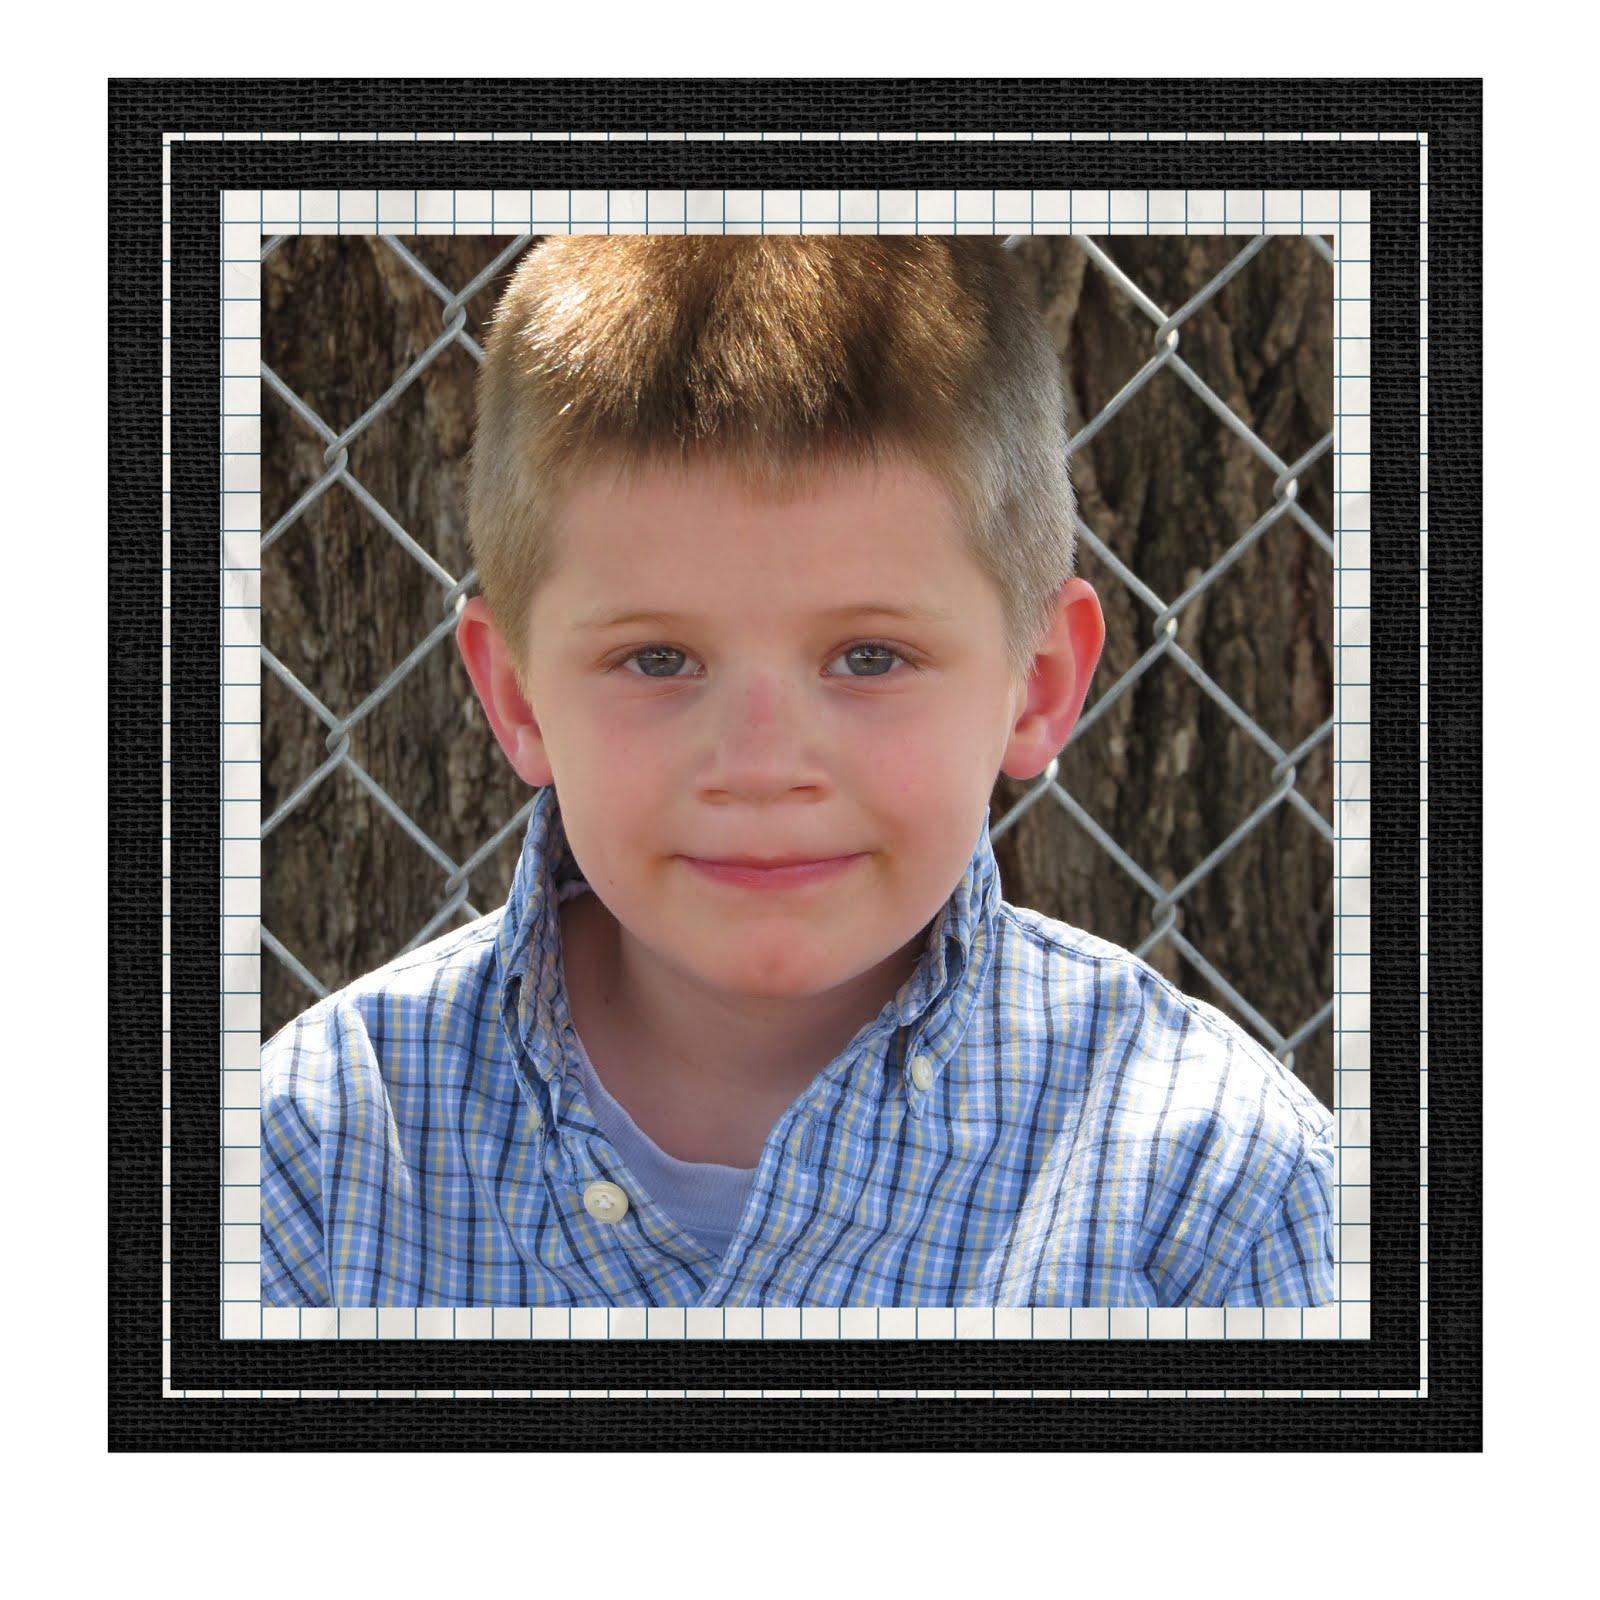 Brandon 2015-2016 School Year Picture